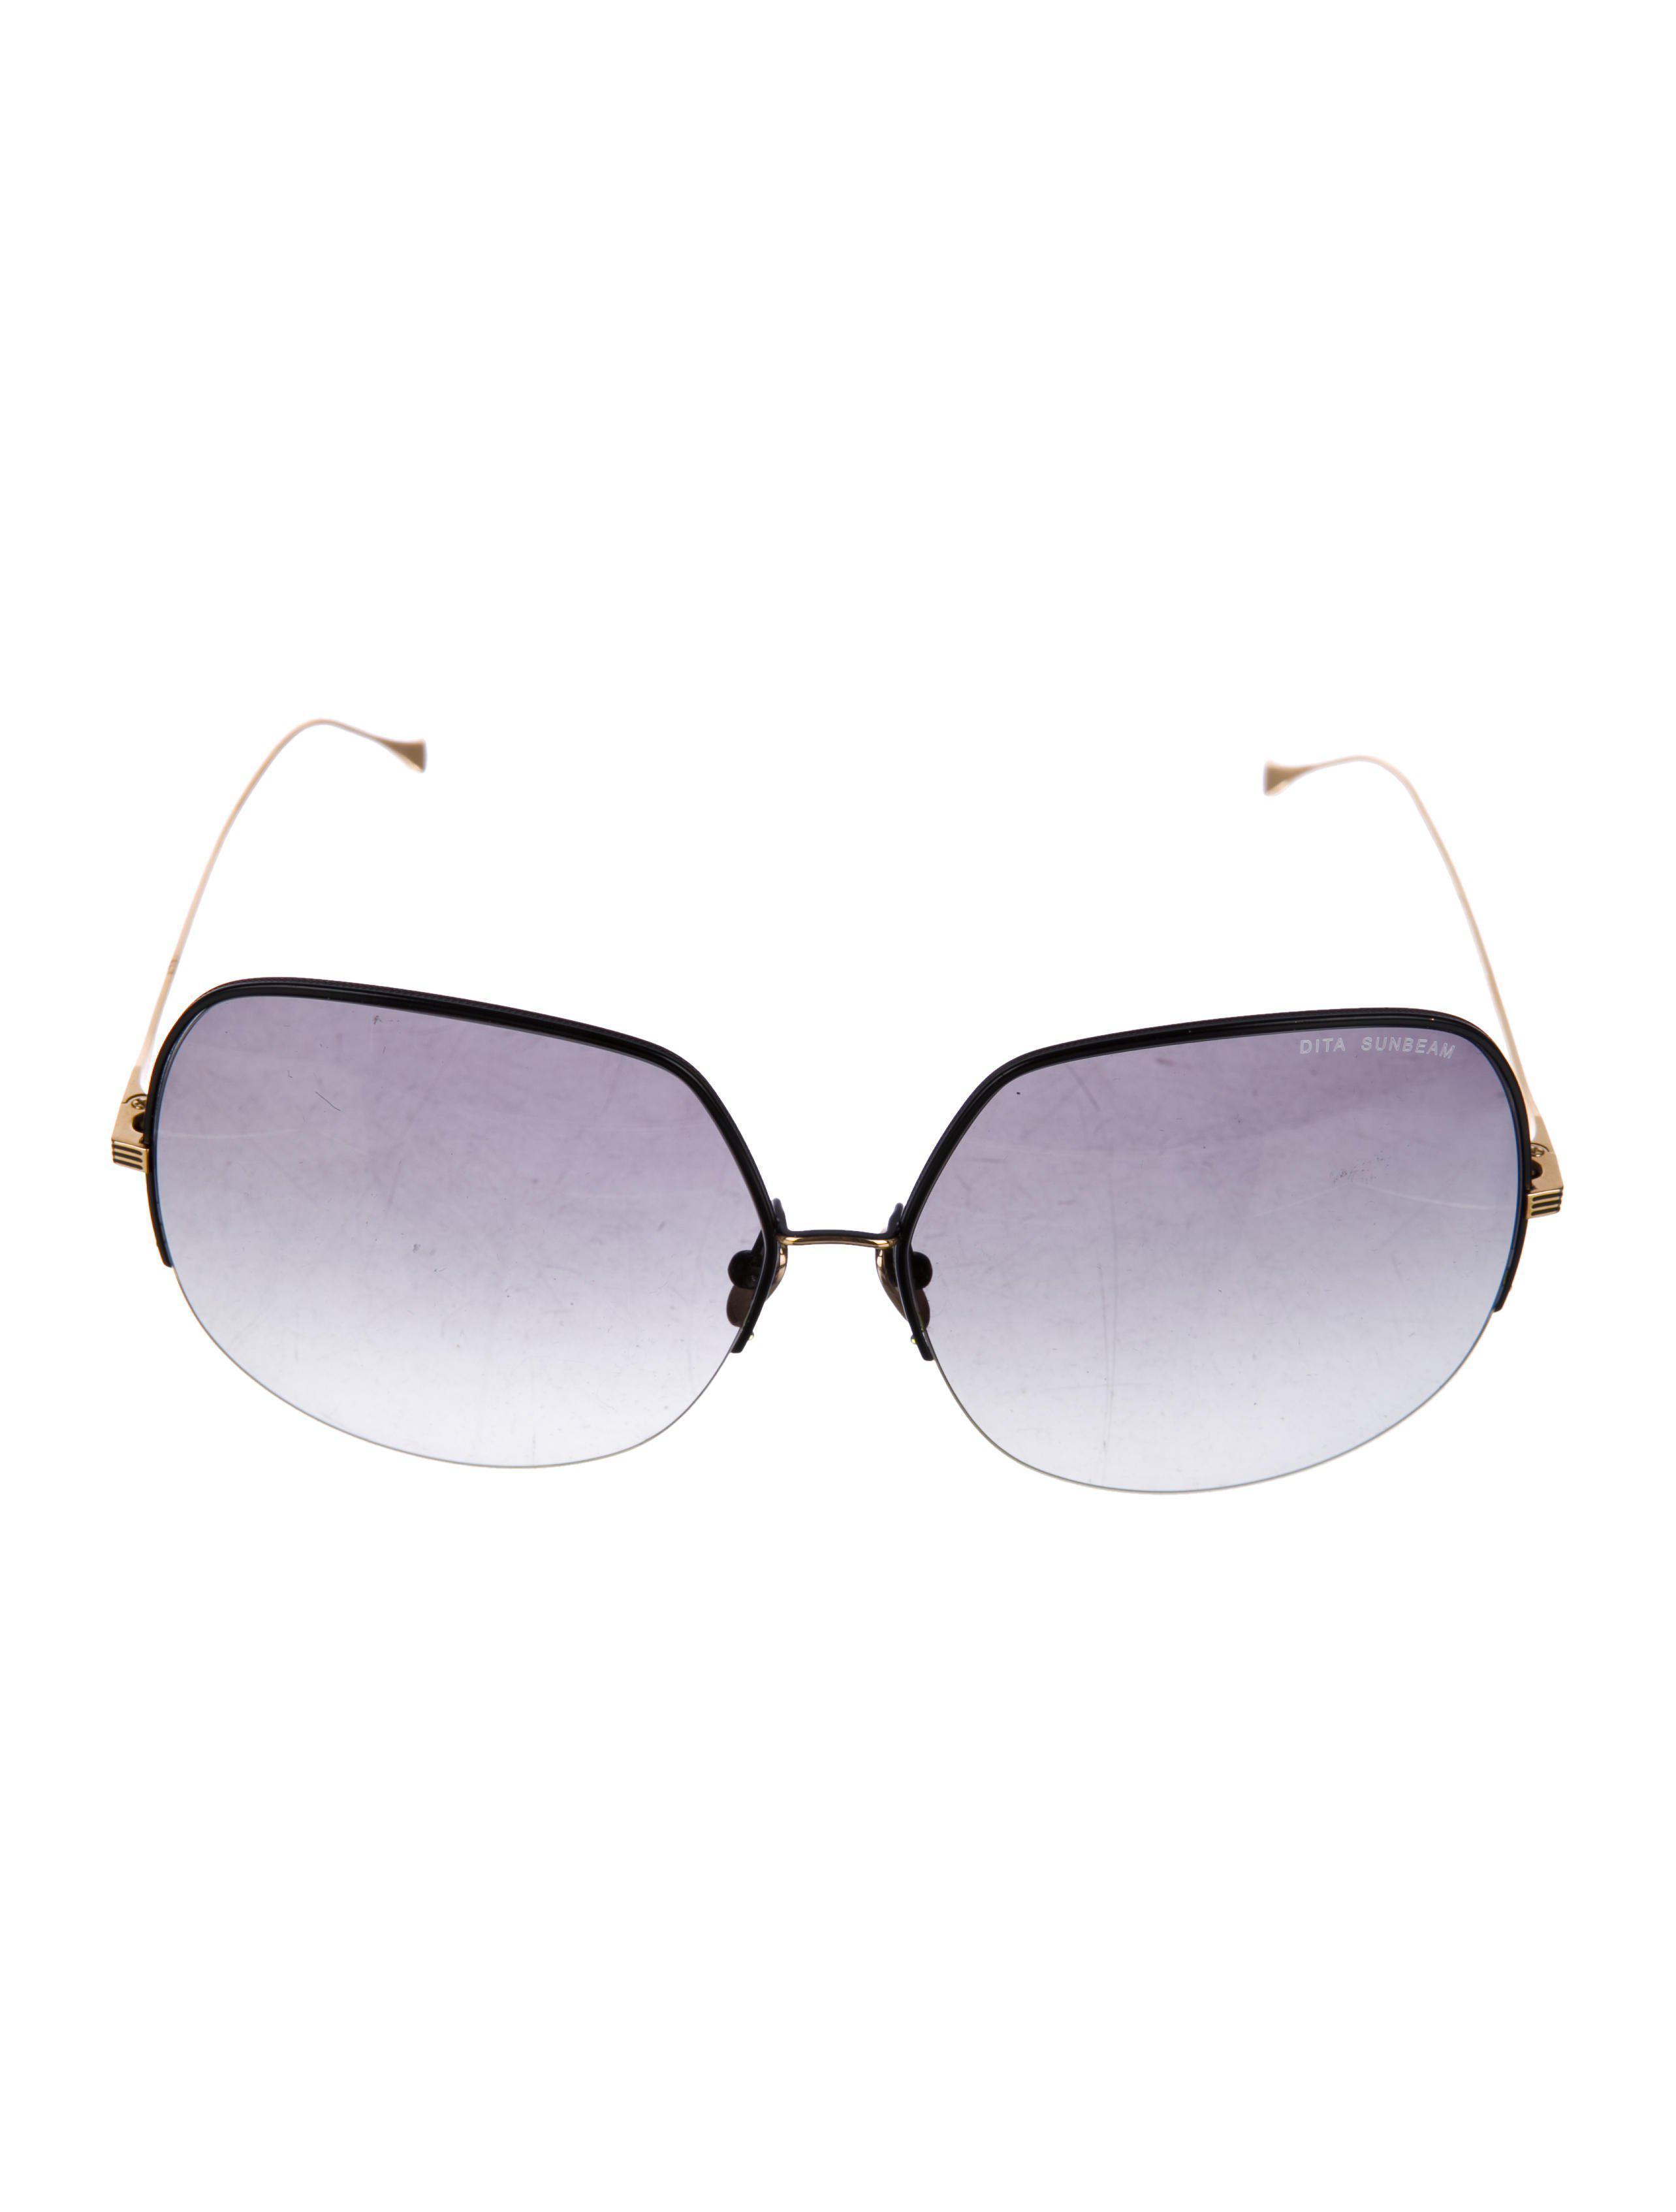 288956031cc6 Lyst - Dita Sunbeam Oversize Sunglasses Gold in Metallic